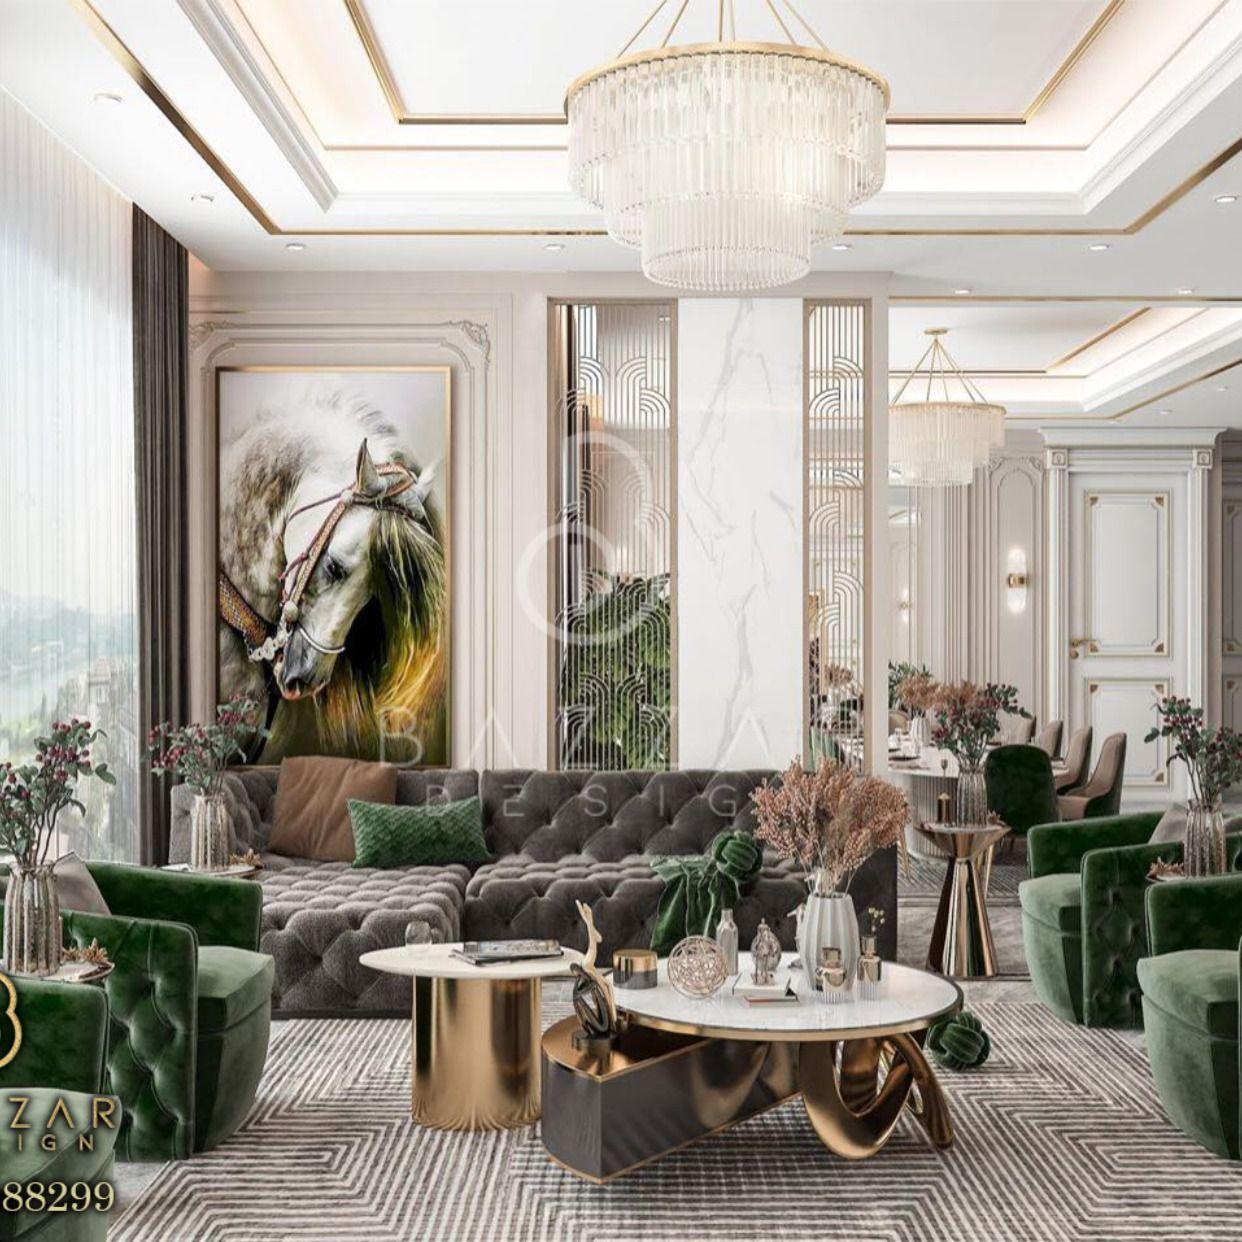 10 Ideas For Living Room Design Living Room Designs Luxury Living Room Living Room